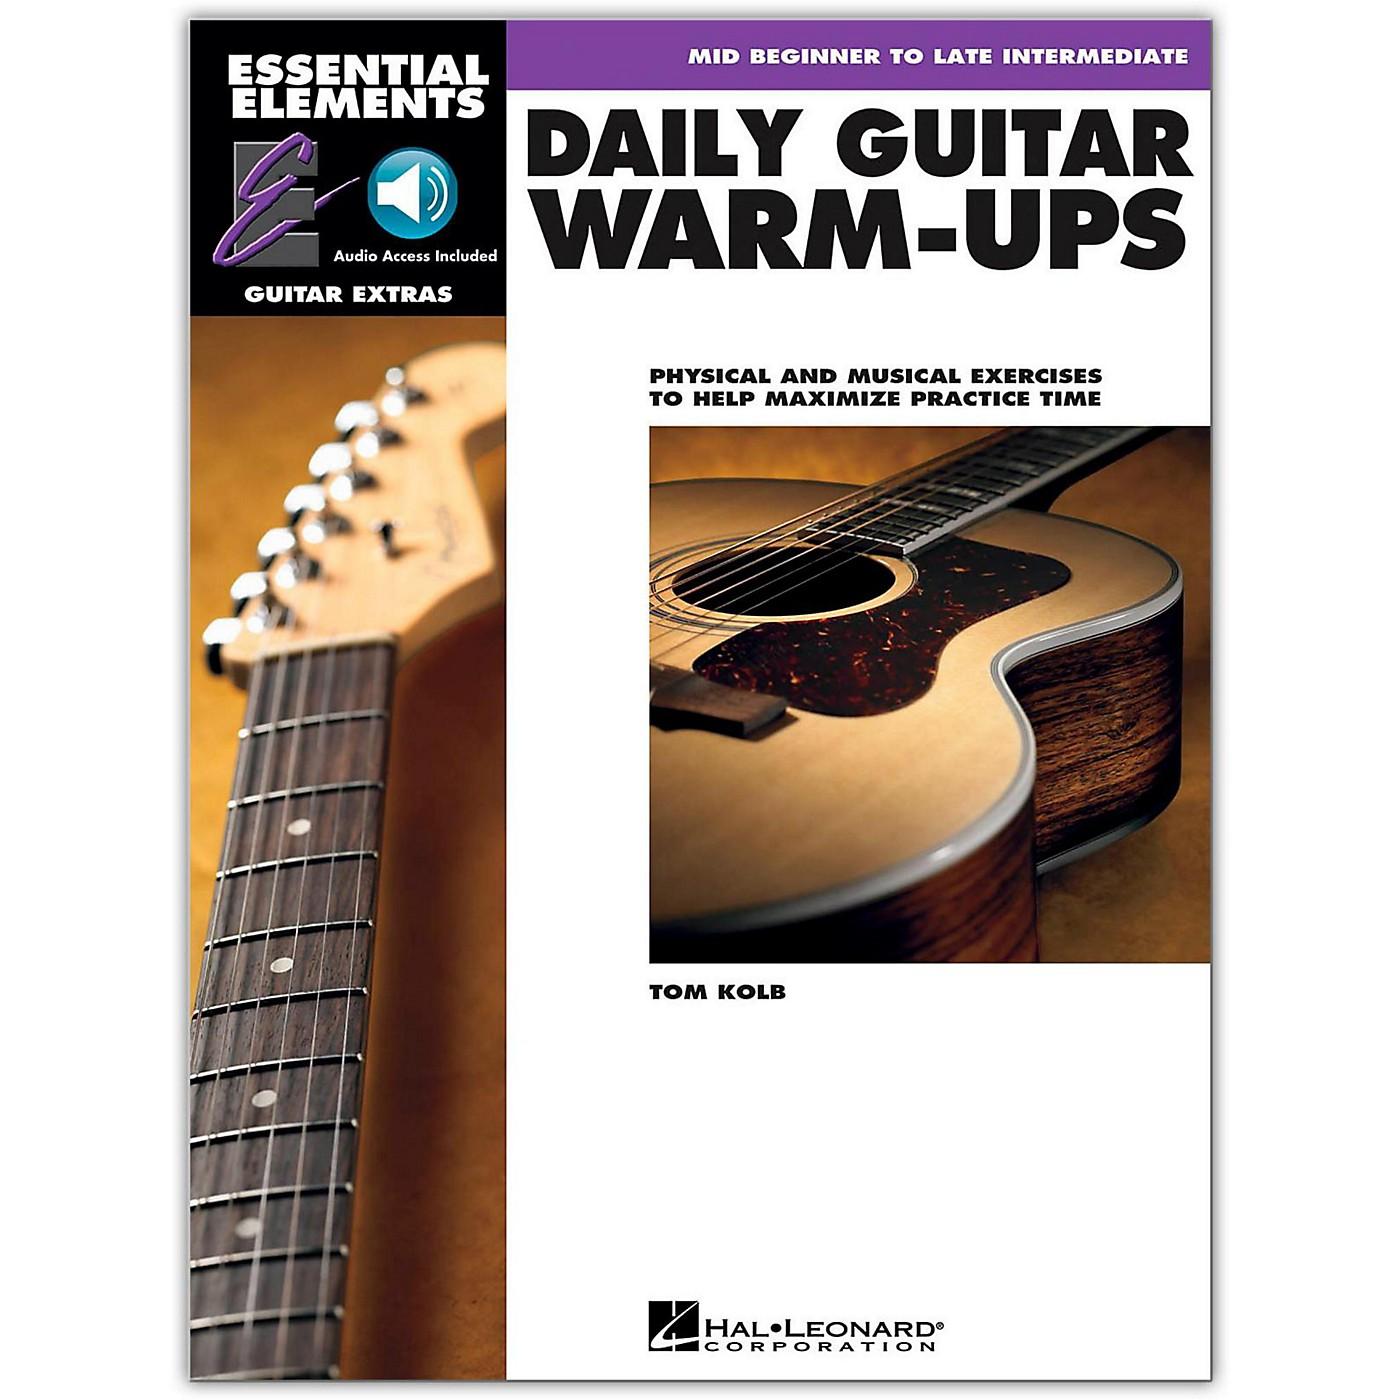 Hal Leonard Daily Guitar Warm-Ups Essential Elements Guitar (Book/Online Audio) thumbnail